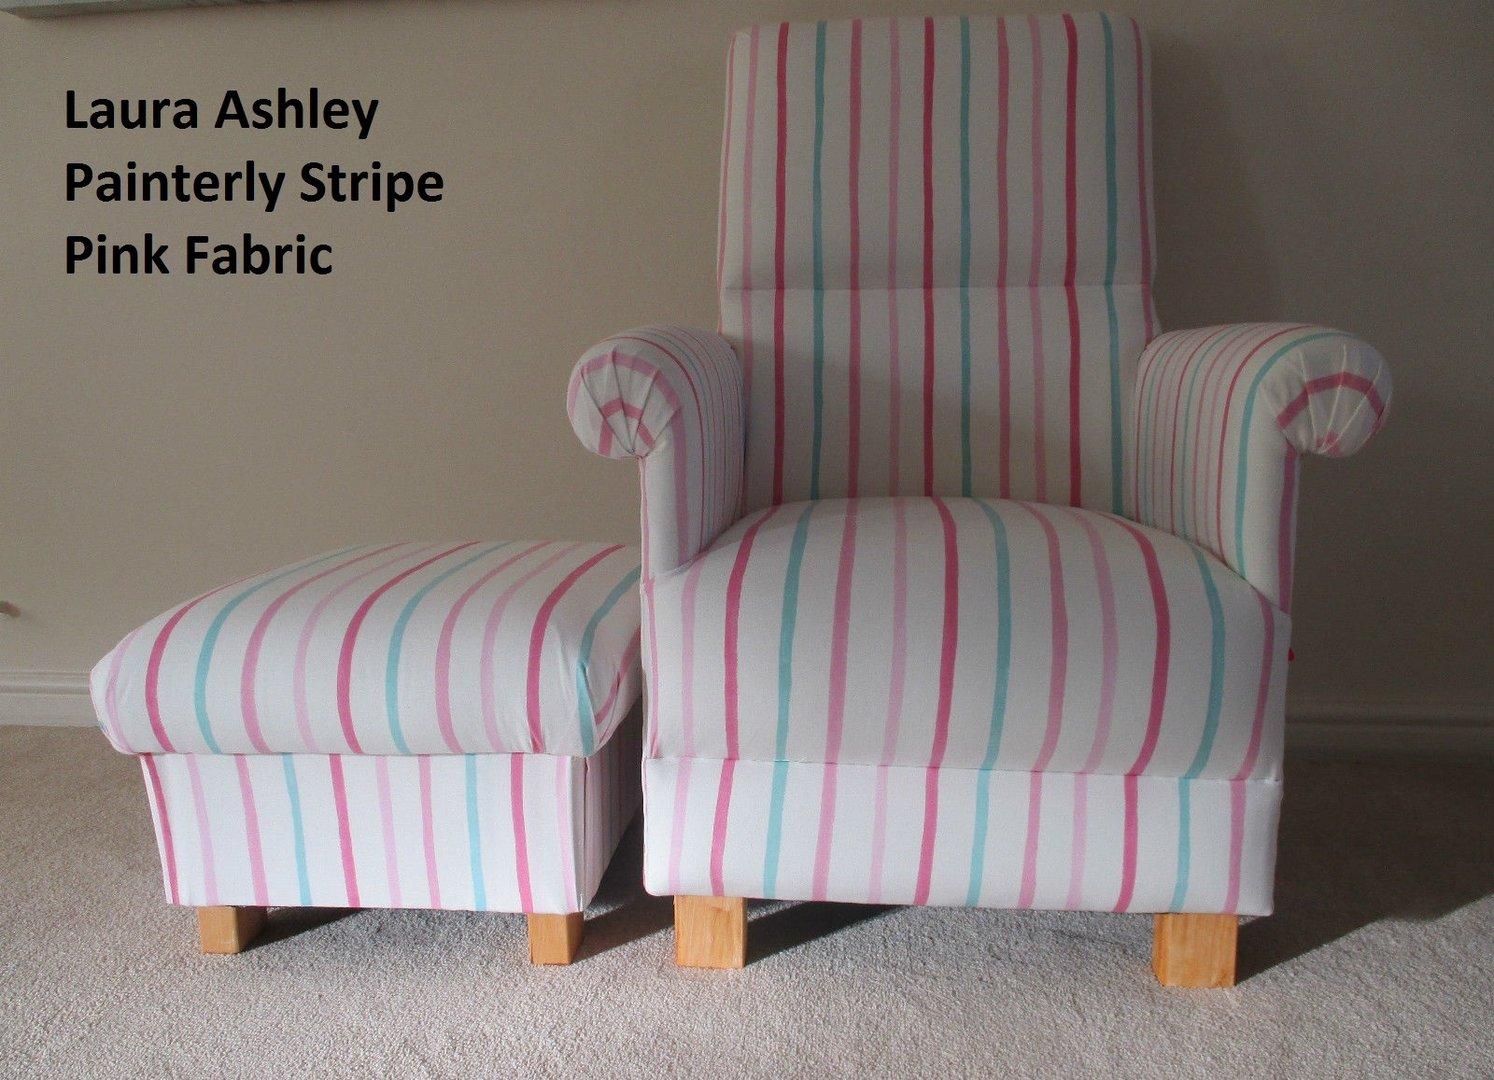 Laura Ashley Bedroom Laura Ashley Painterly Stripe Pink Chair Footstool Nursery